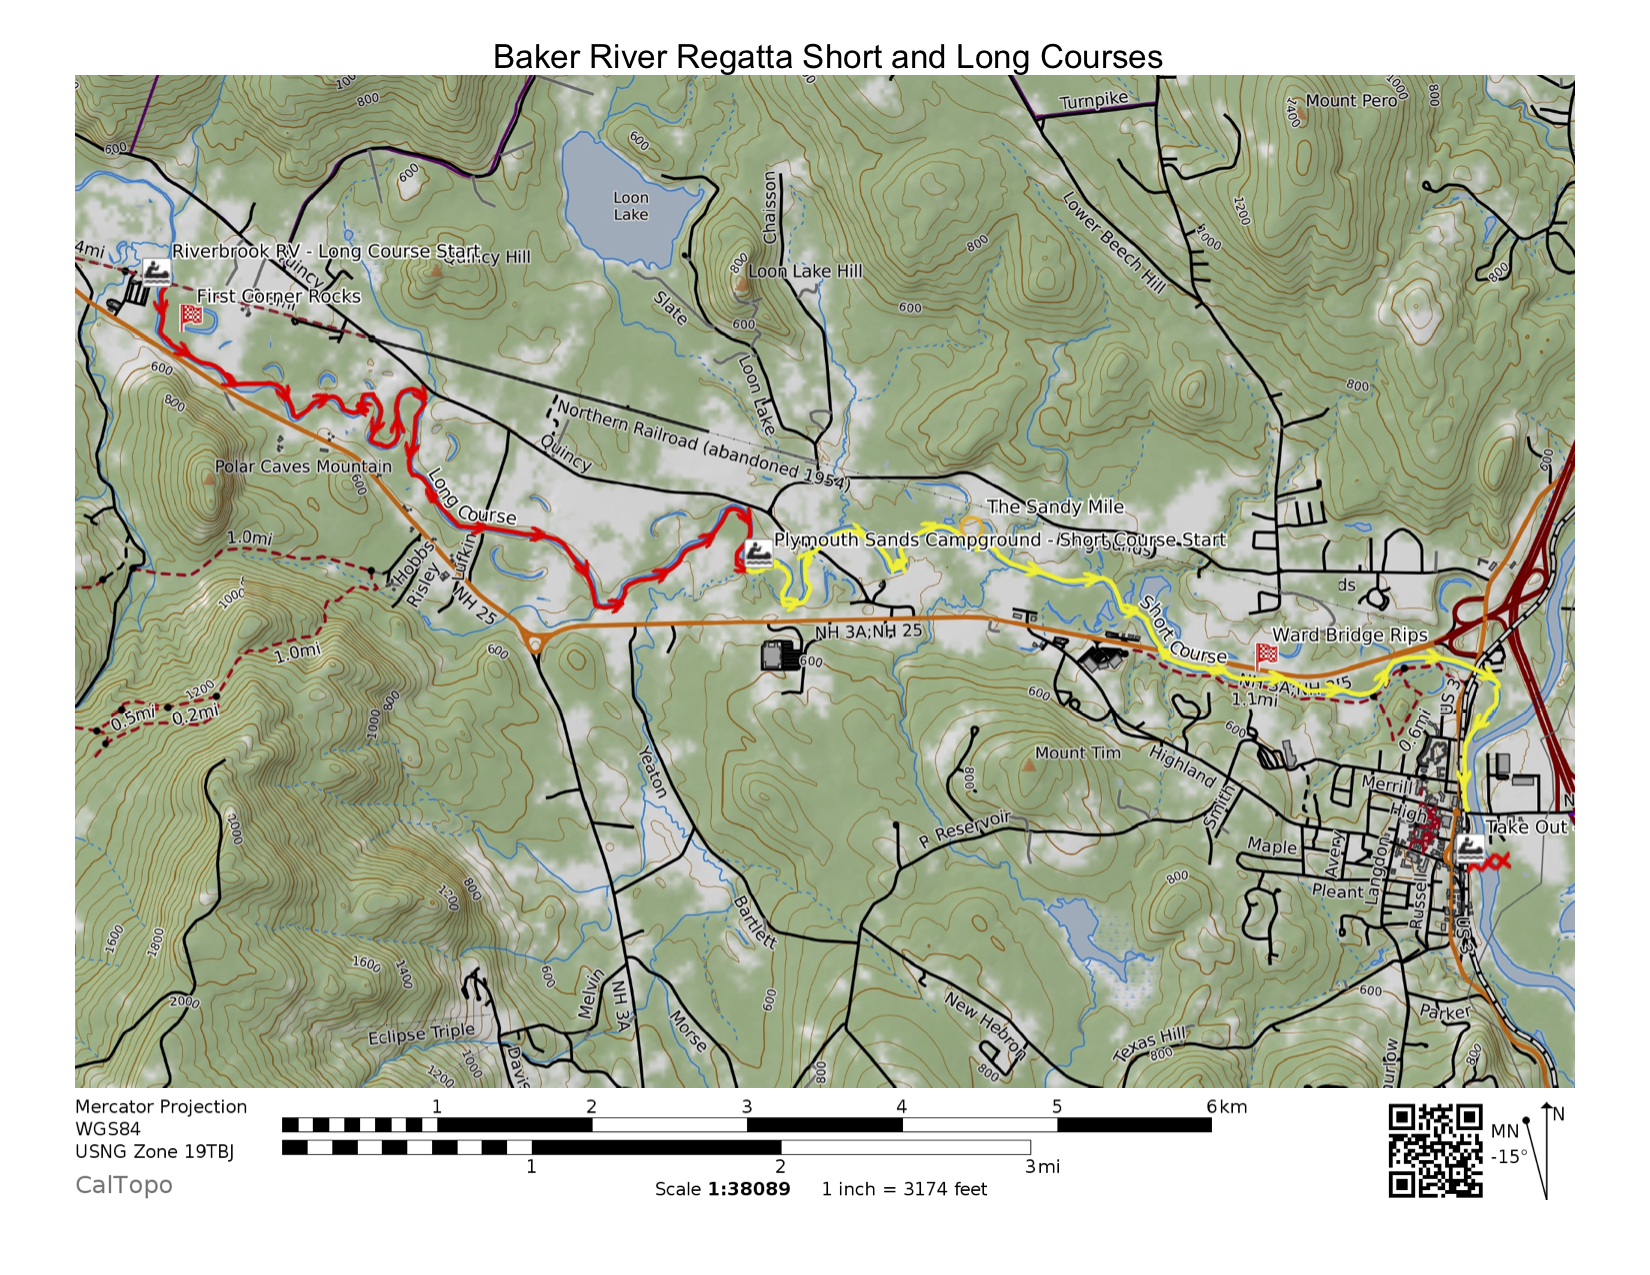 Regatta Course - Short and Long.jpg